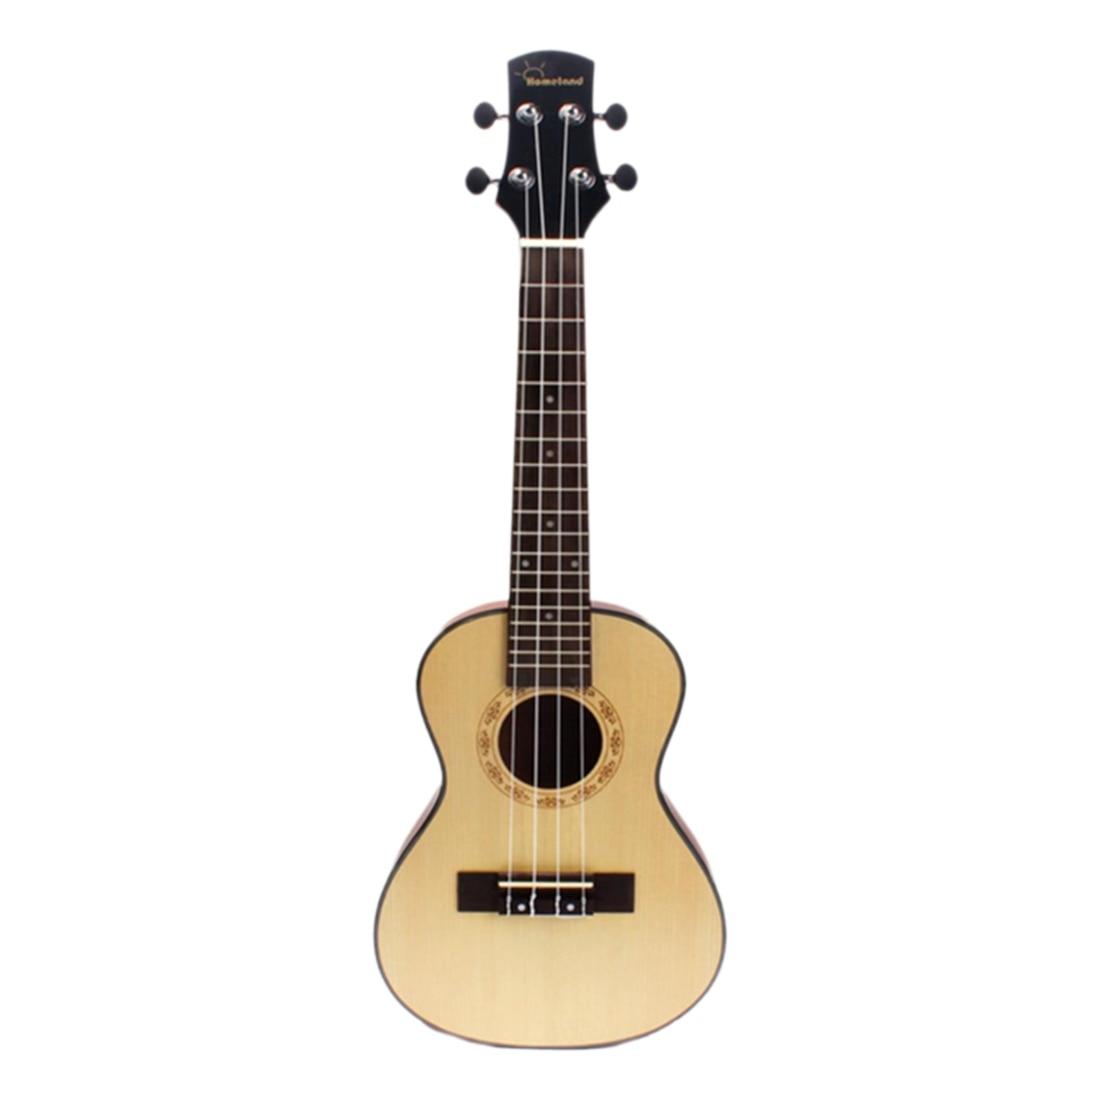 Petite guitare hawaïenne compacte 4 cordes 24''